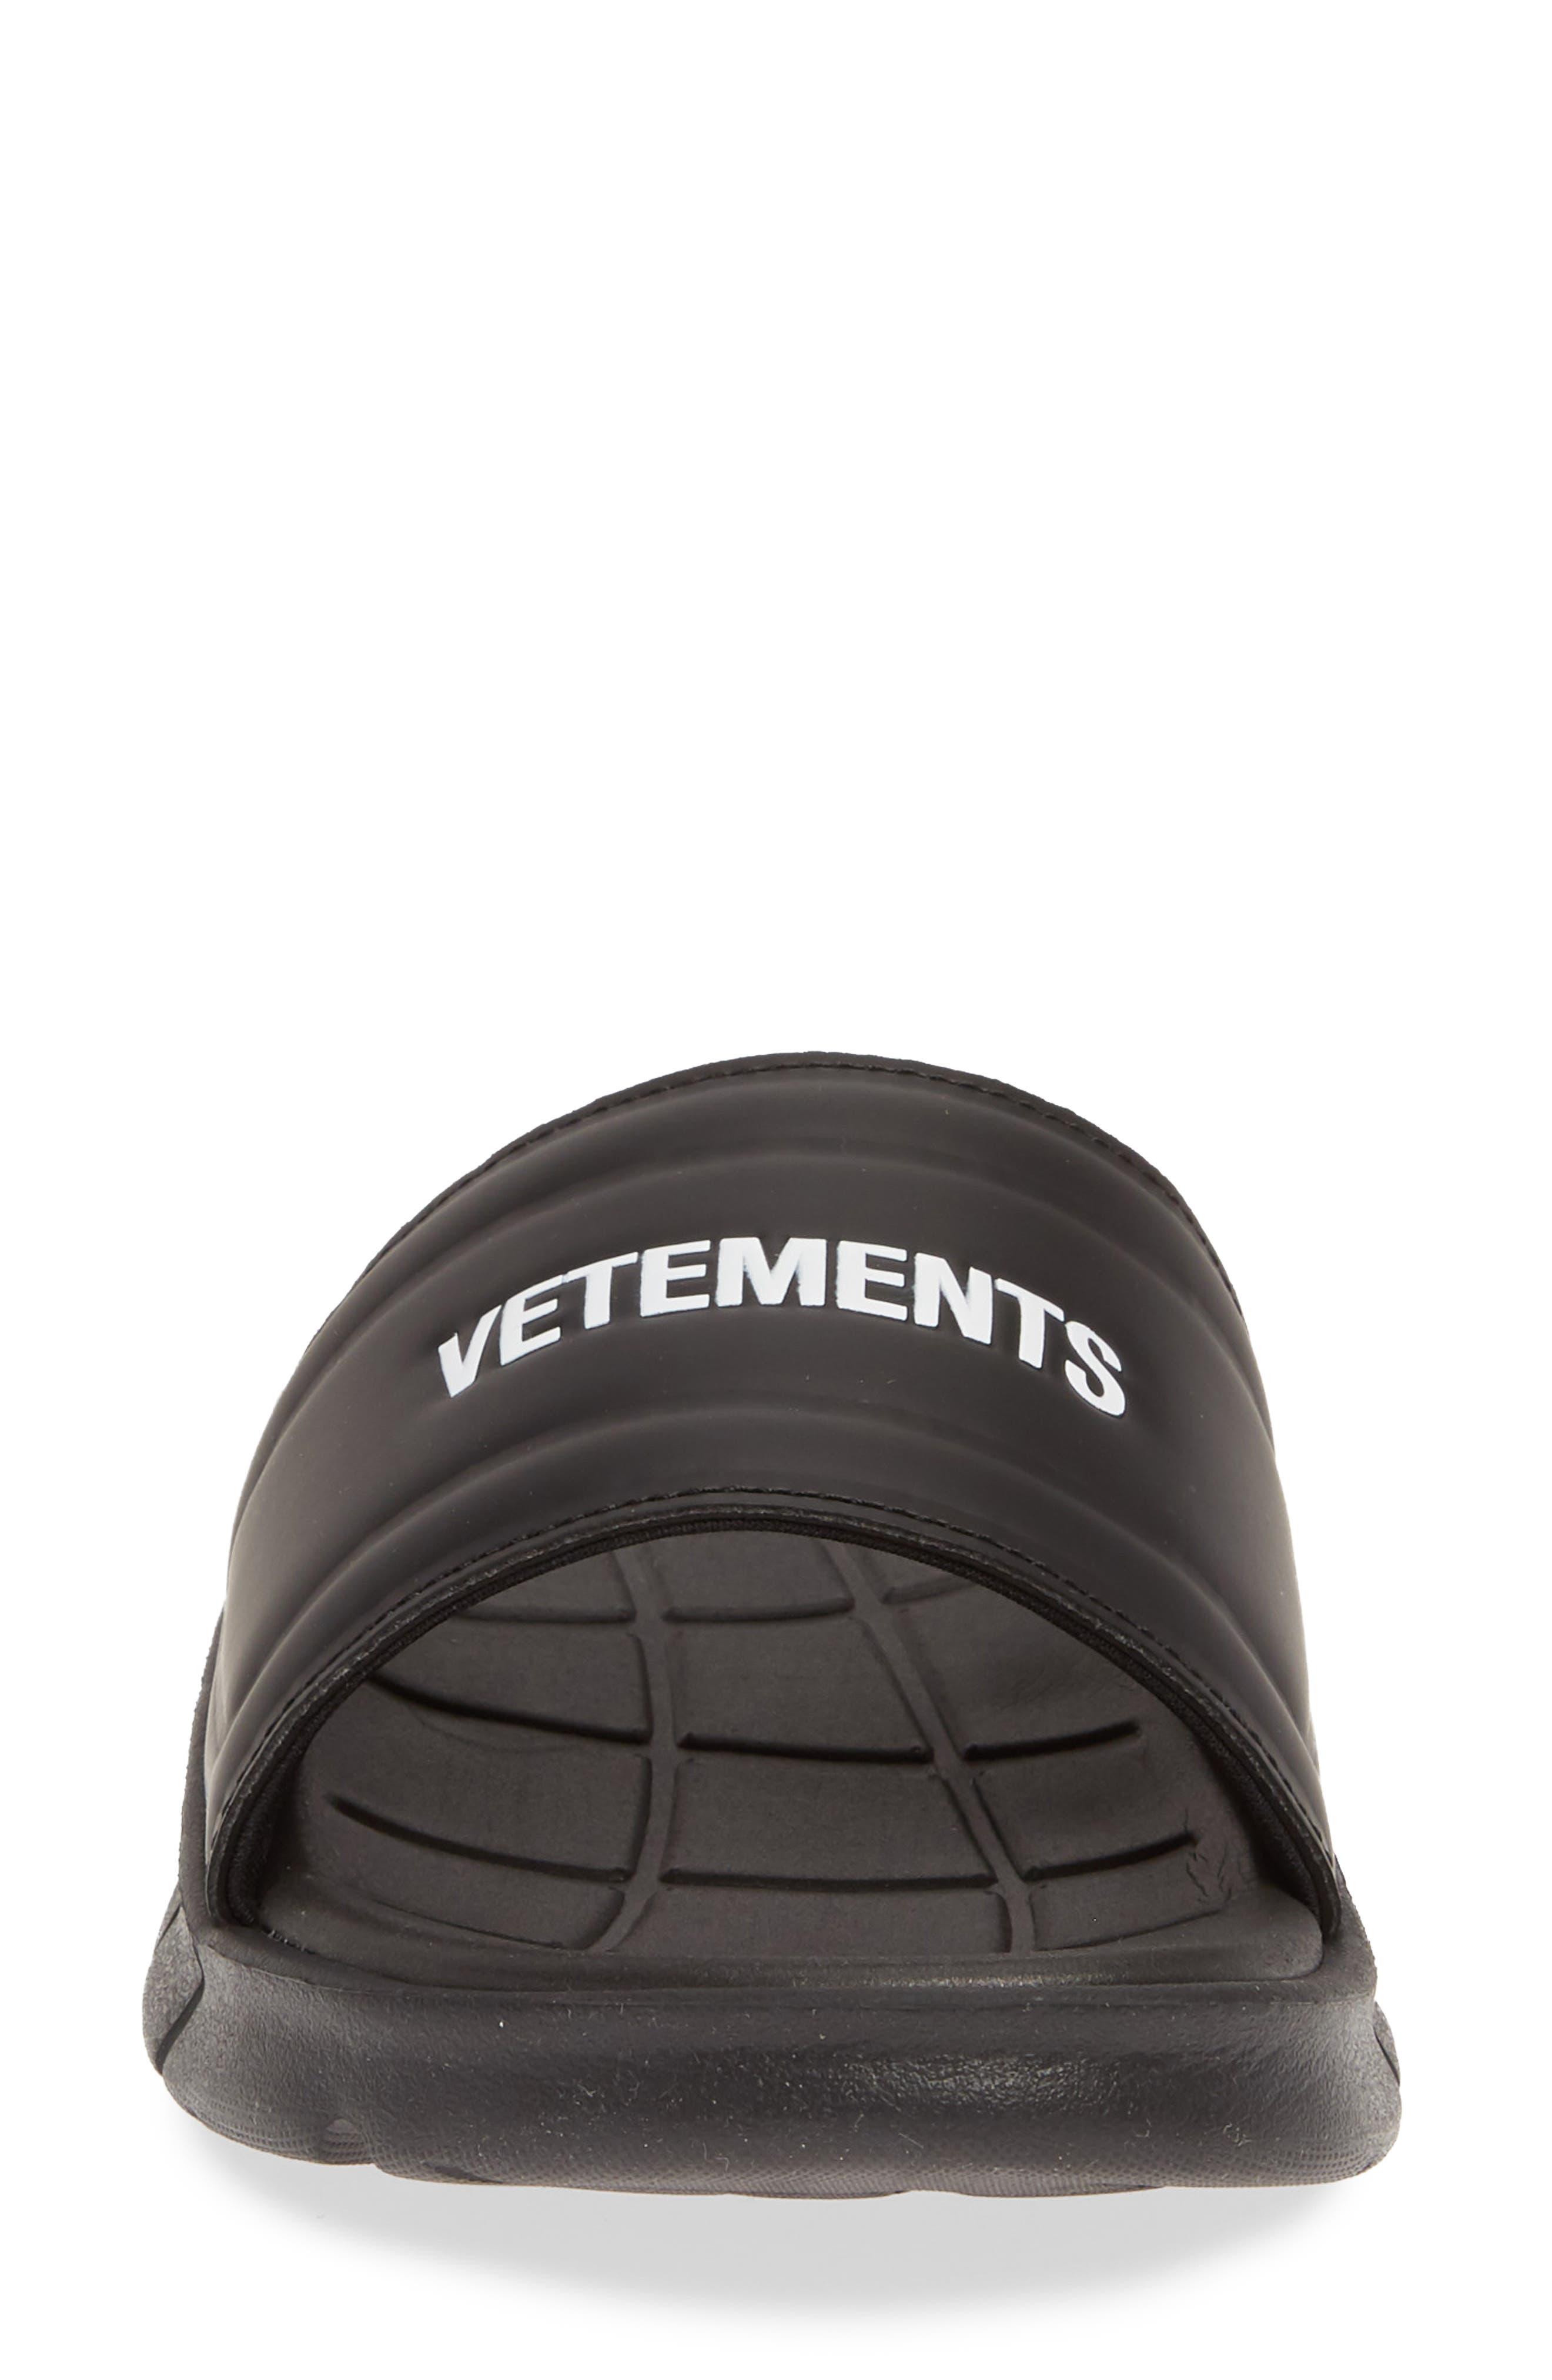 VETEMENTS, x Reebok Logo Slide Sandal, Alternate thumbnail 4, color, BLACK/ WHITE